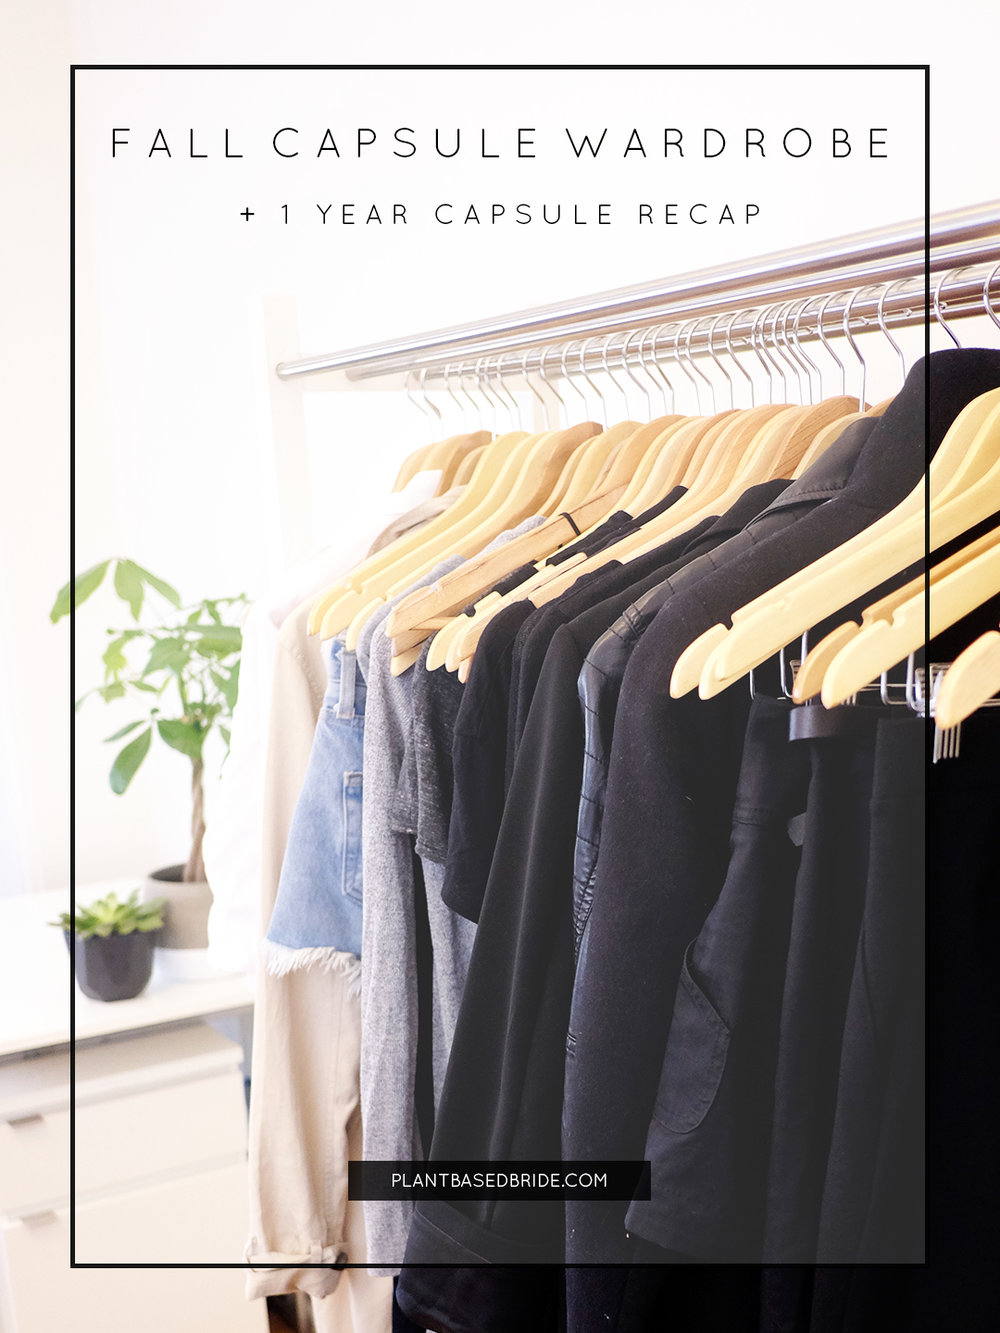 Fall Capsule Wardrobe 2016 + 1 Year Capsule Wardrobe Recap! // Plant Based Bride